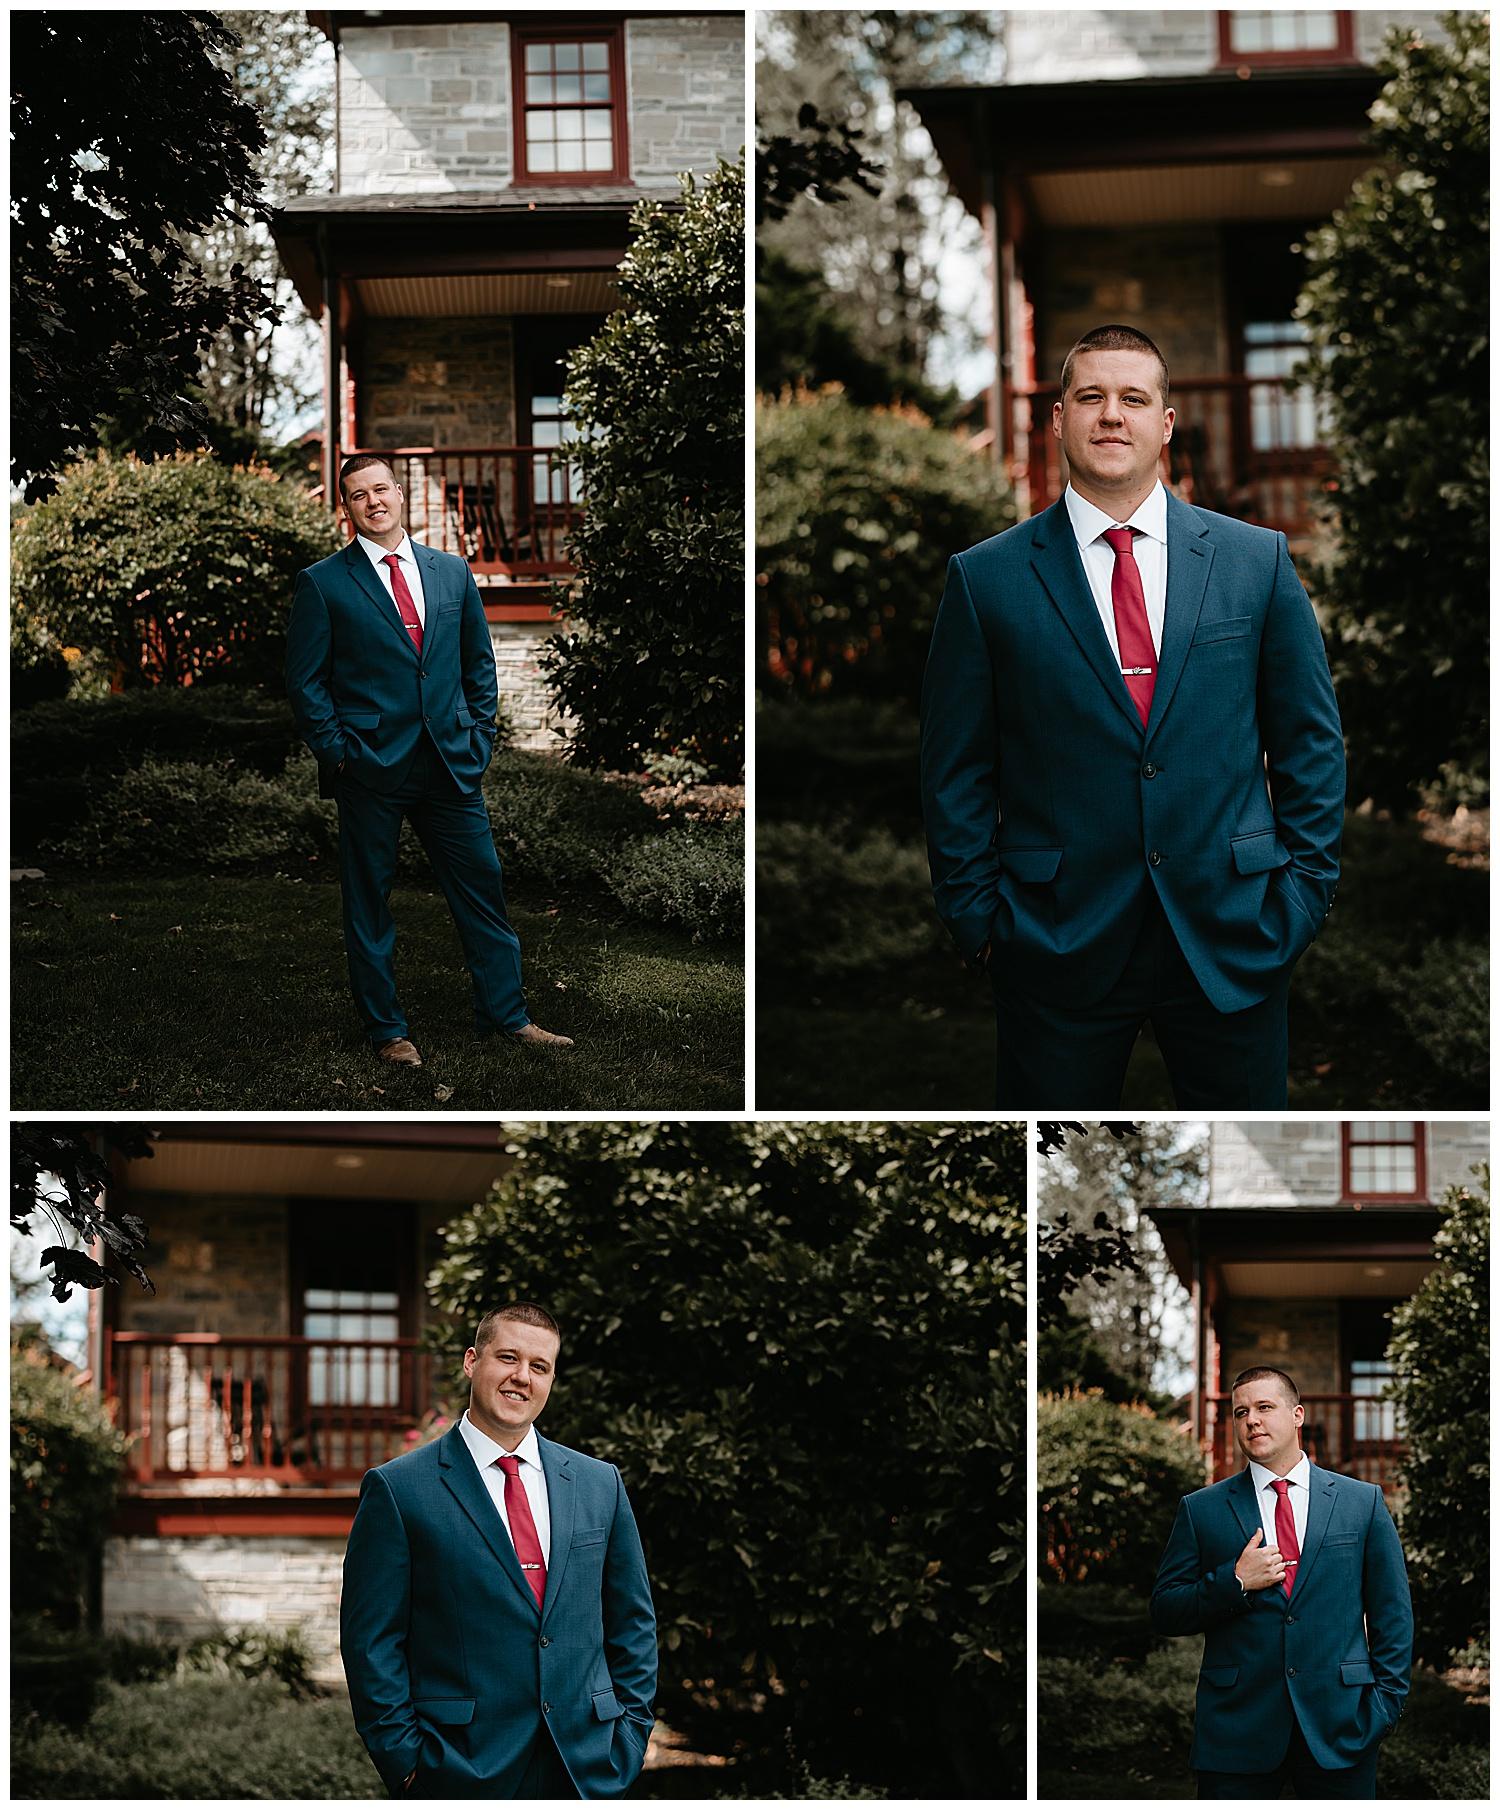 NEPA-Bloomgsburg-Wedding-Photographer-at-The-Barn-at-Greystone-Farms-Watsontown-PA_0052.jpg